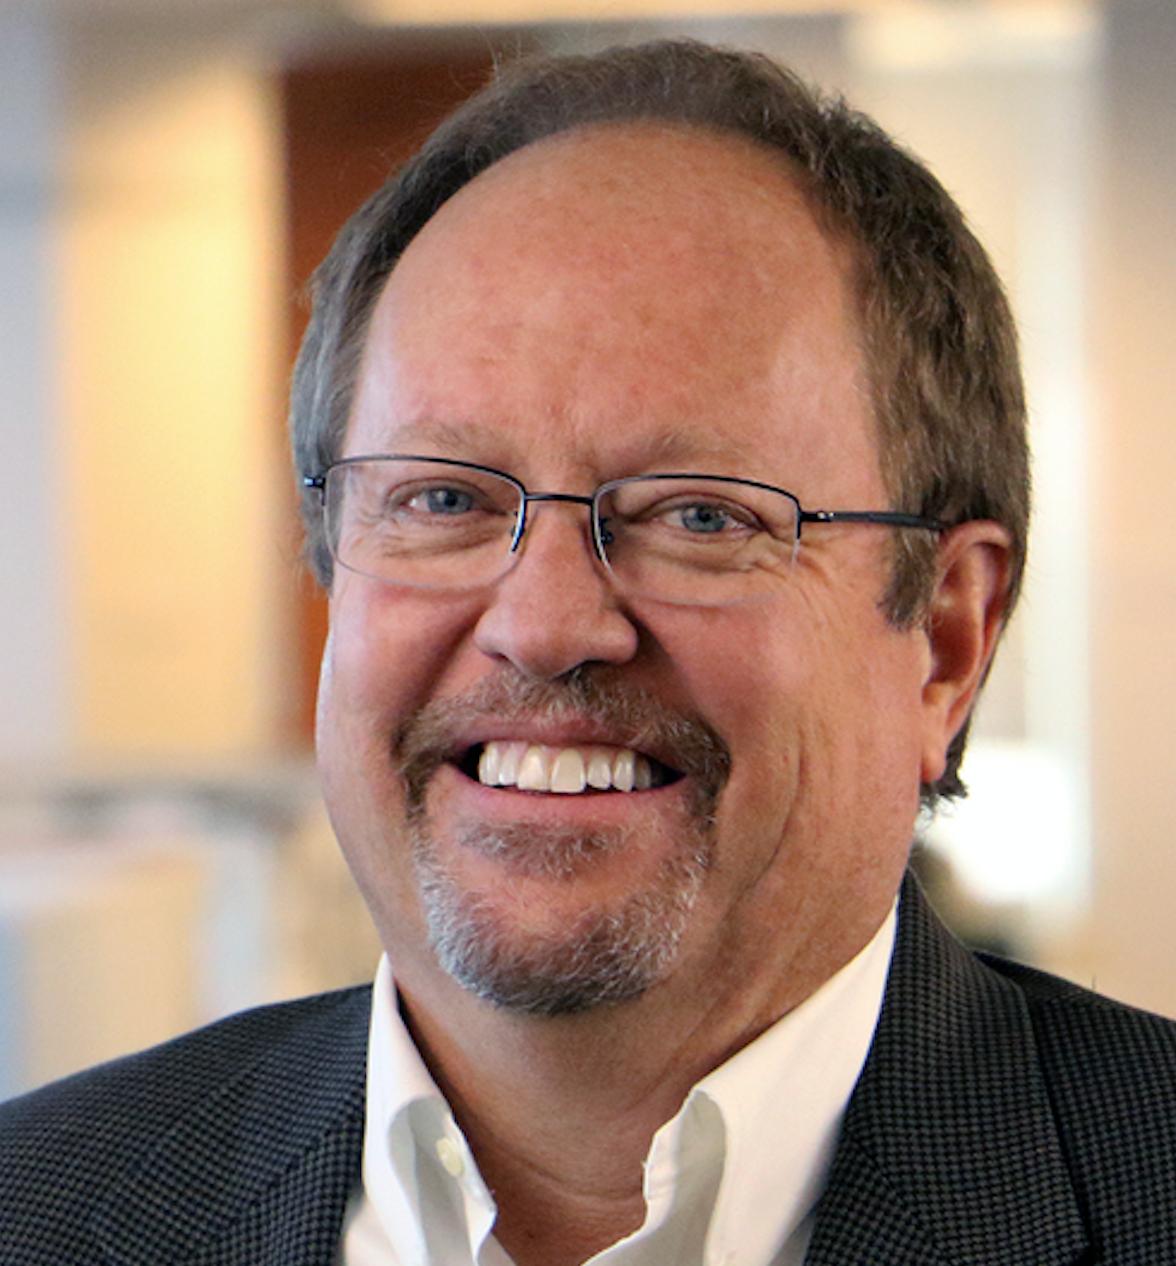 John Street, CEO Pax8